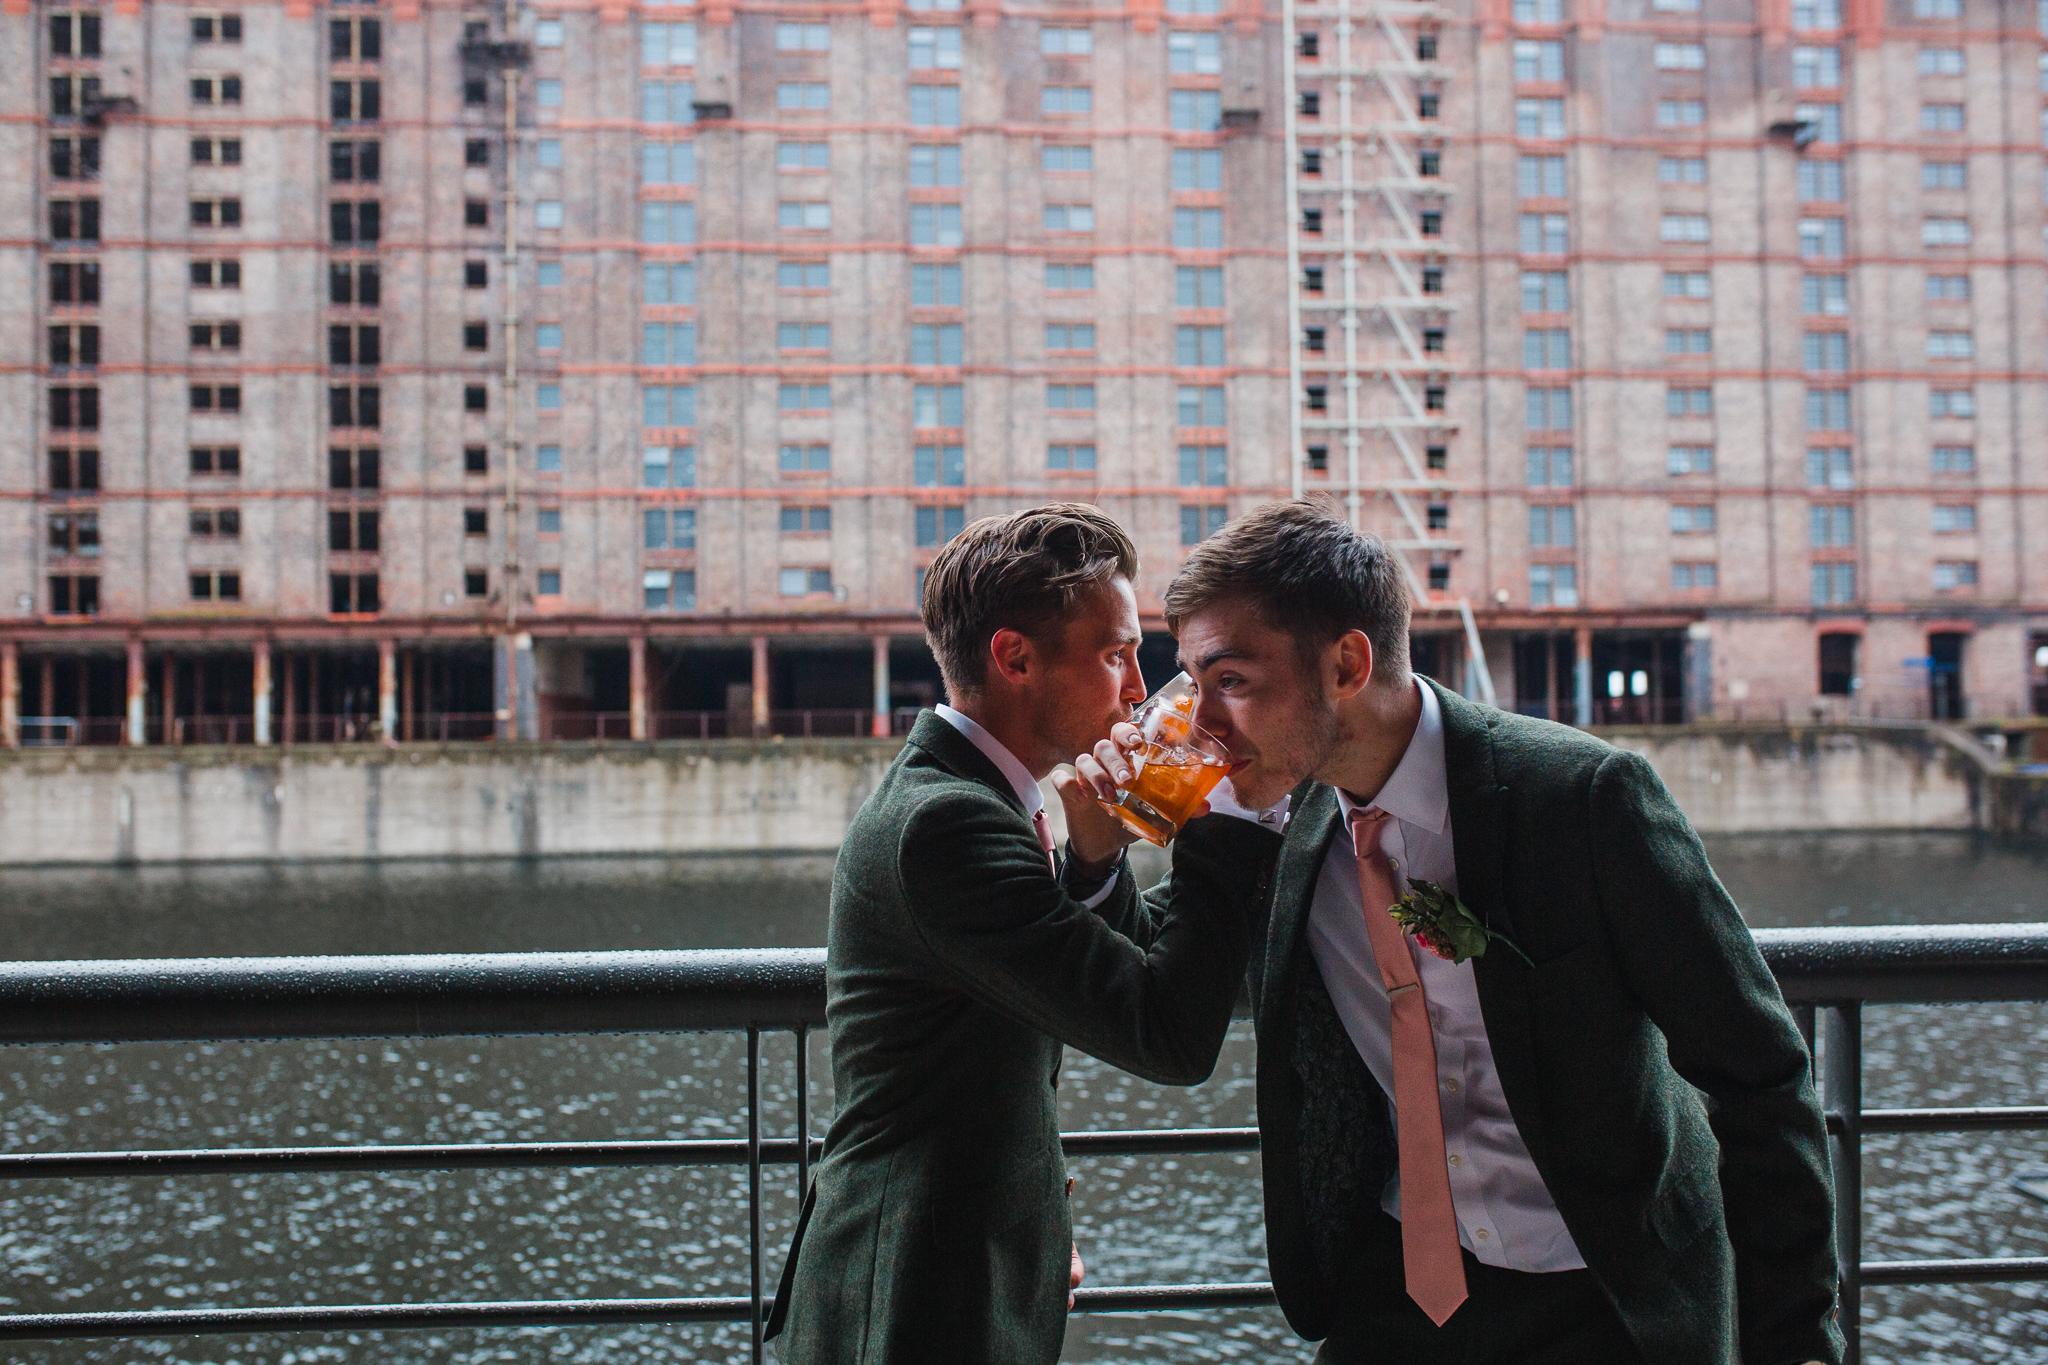 Jess and Ben - Liverpool wedding - best man and groom